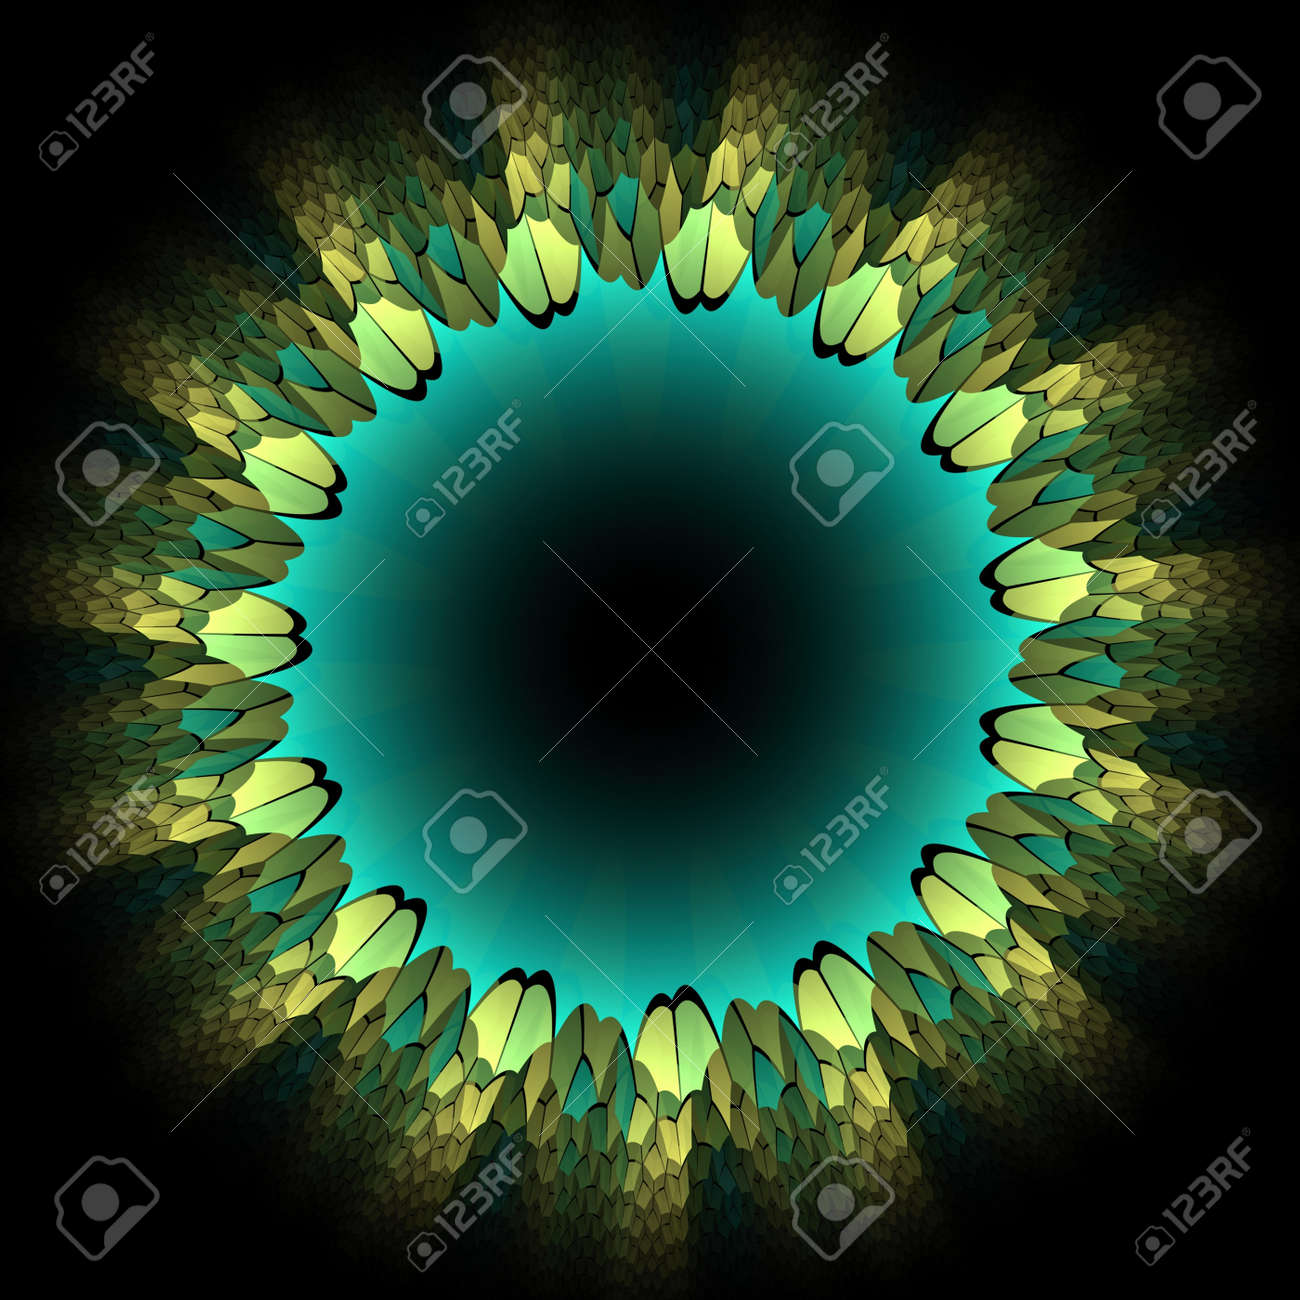 Flower petals abstract flame fractal design border or frame Stock Photo - 13848844